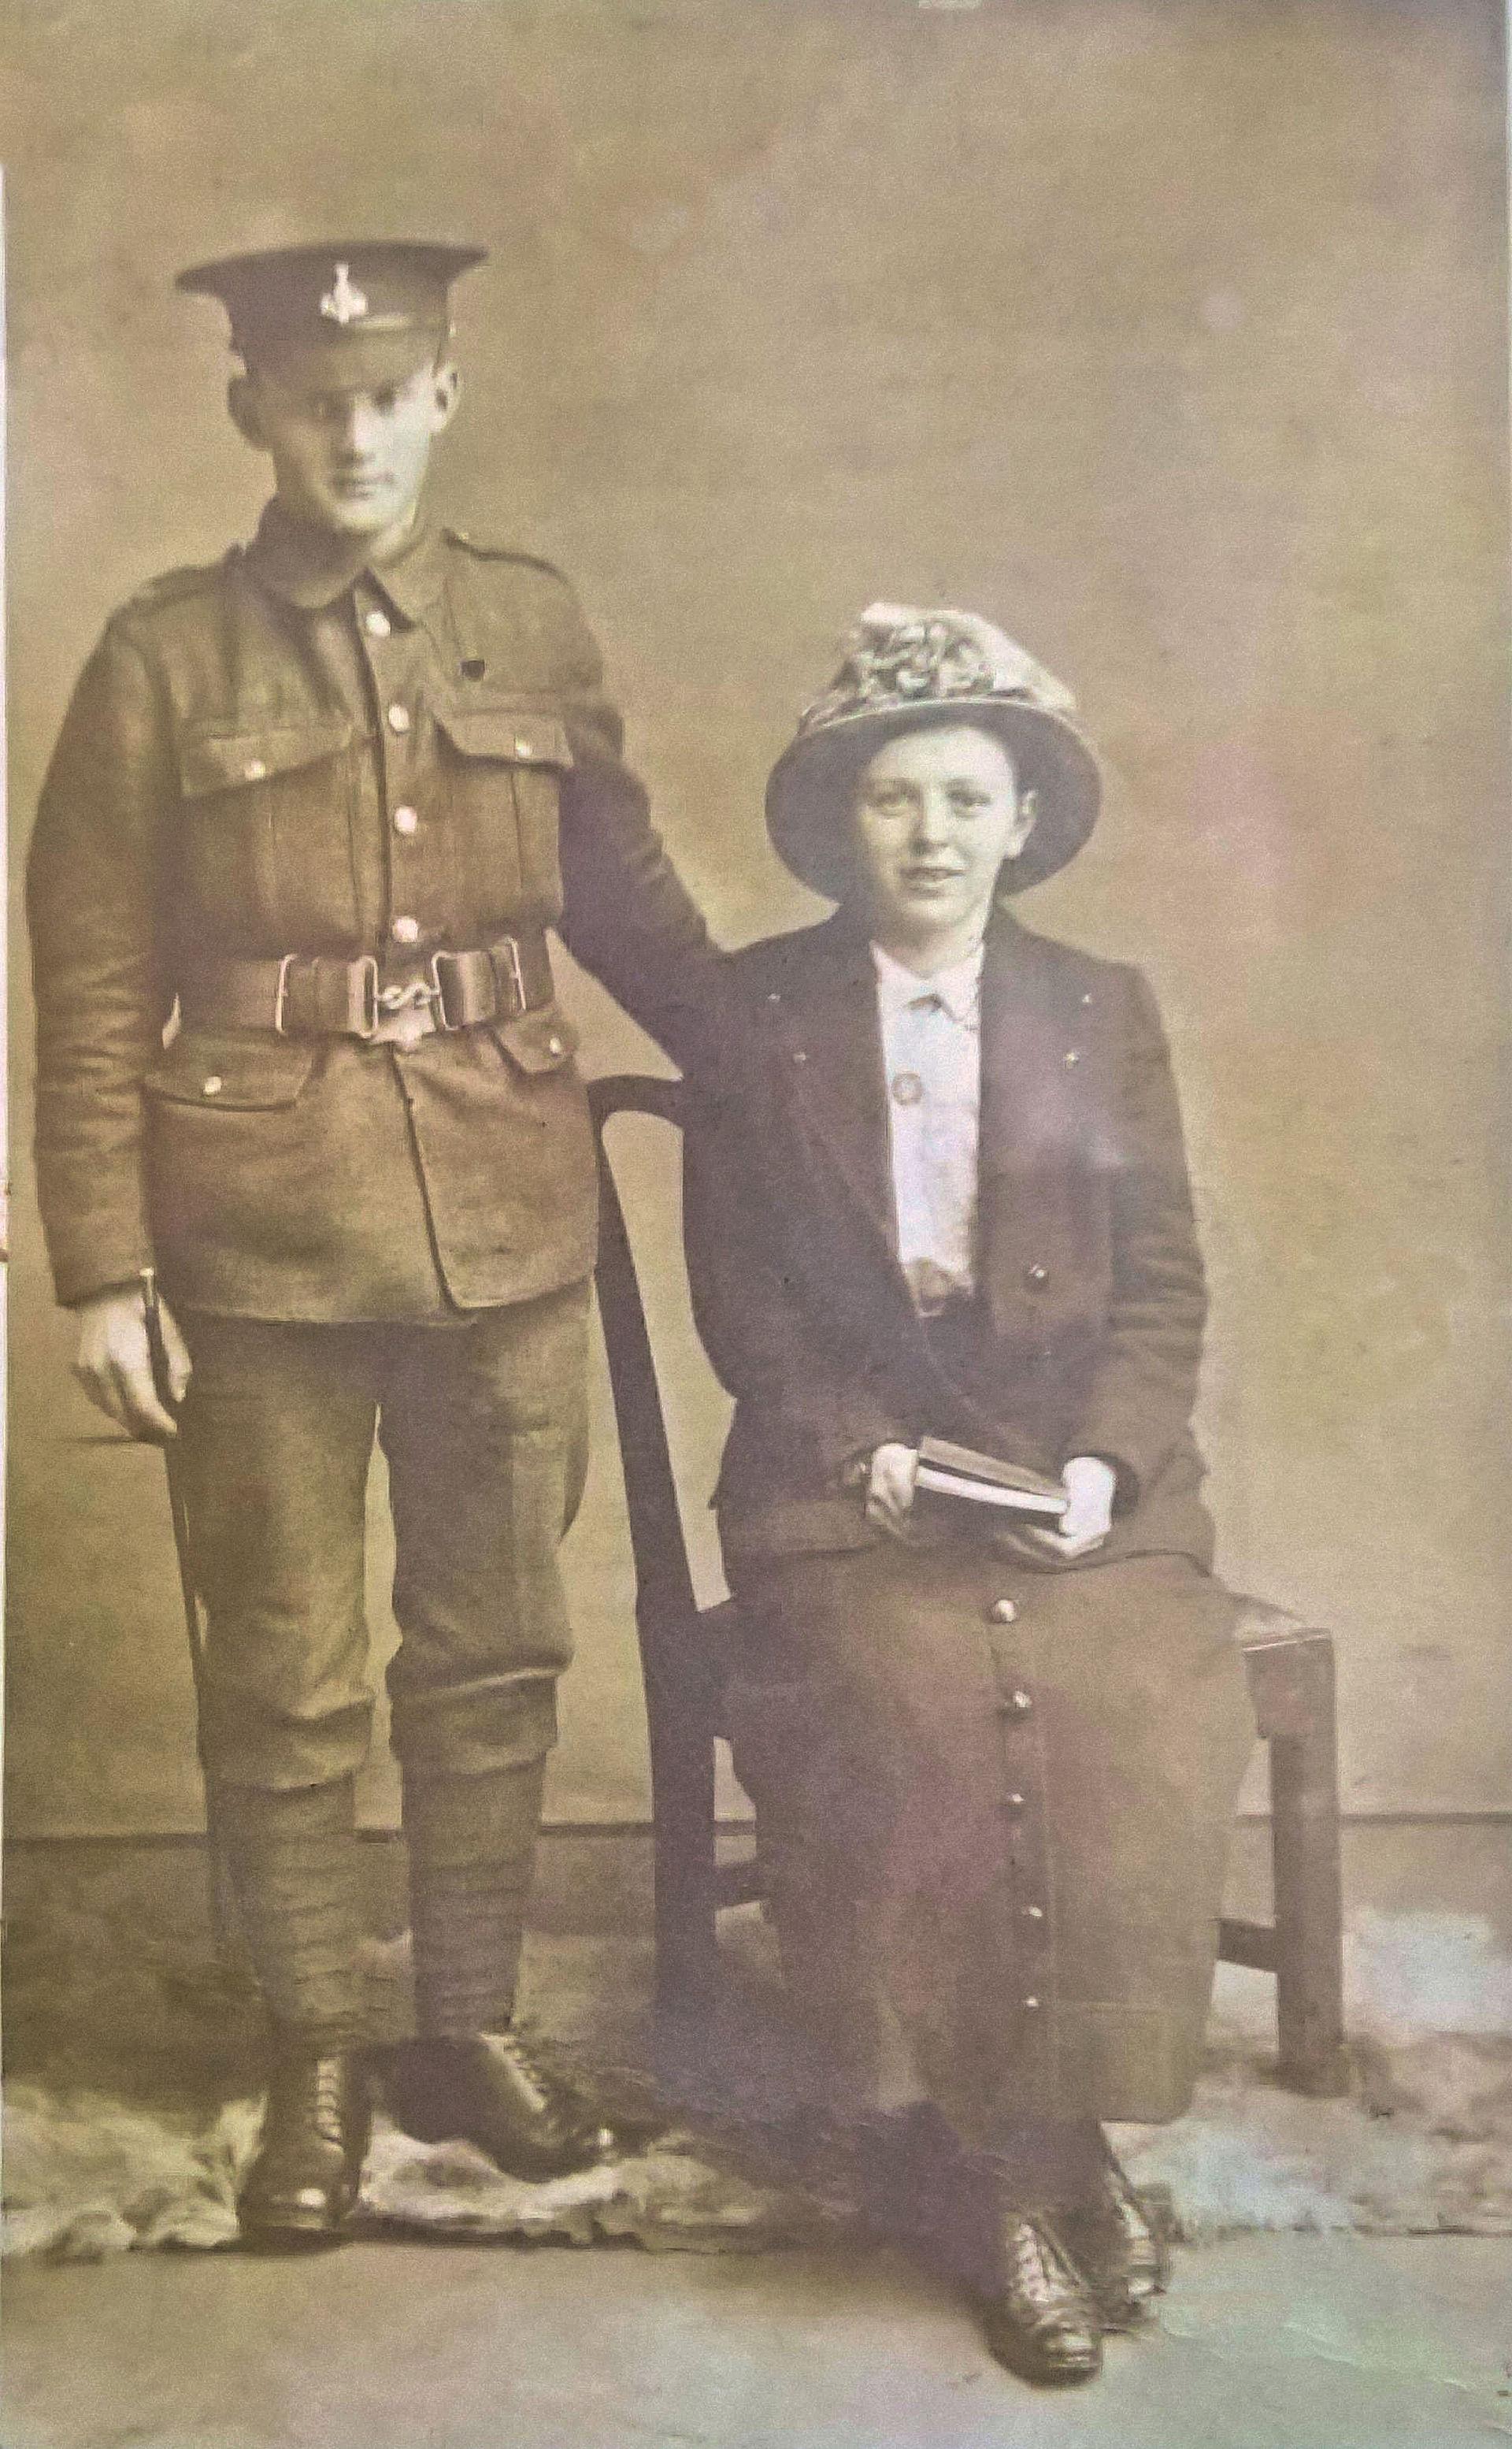 Harold Binks & Hannah Paley  on their wedding day, May 1916